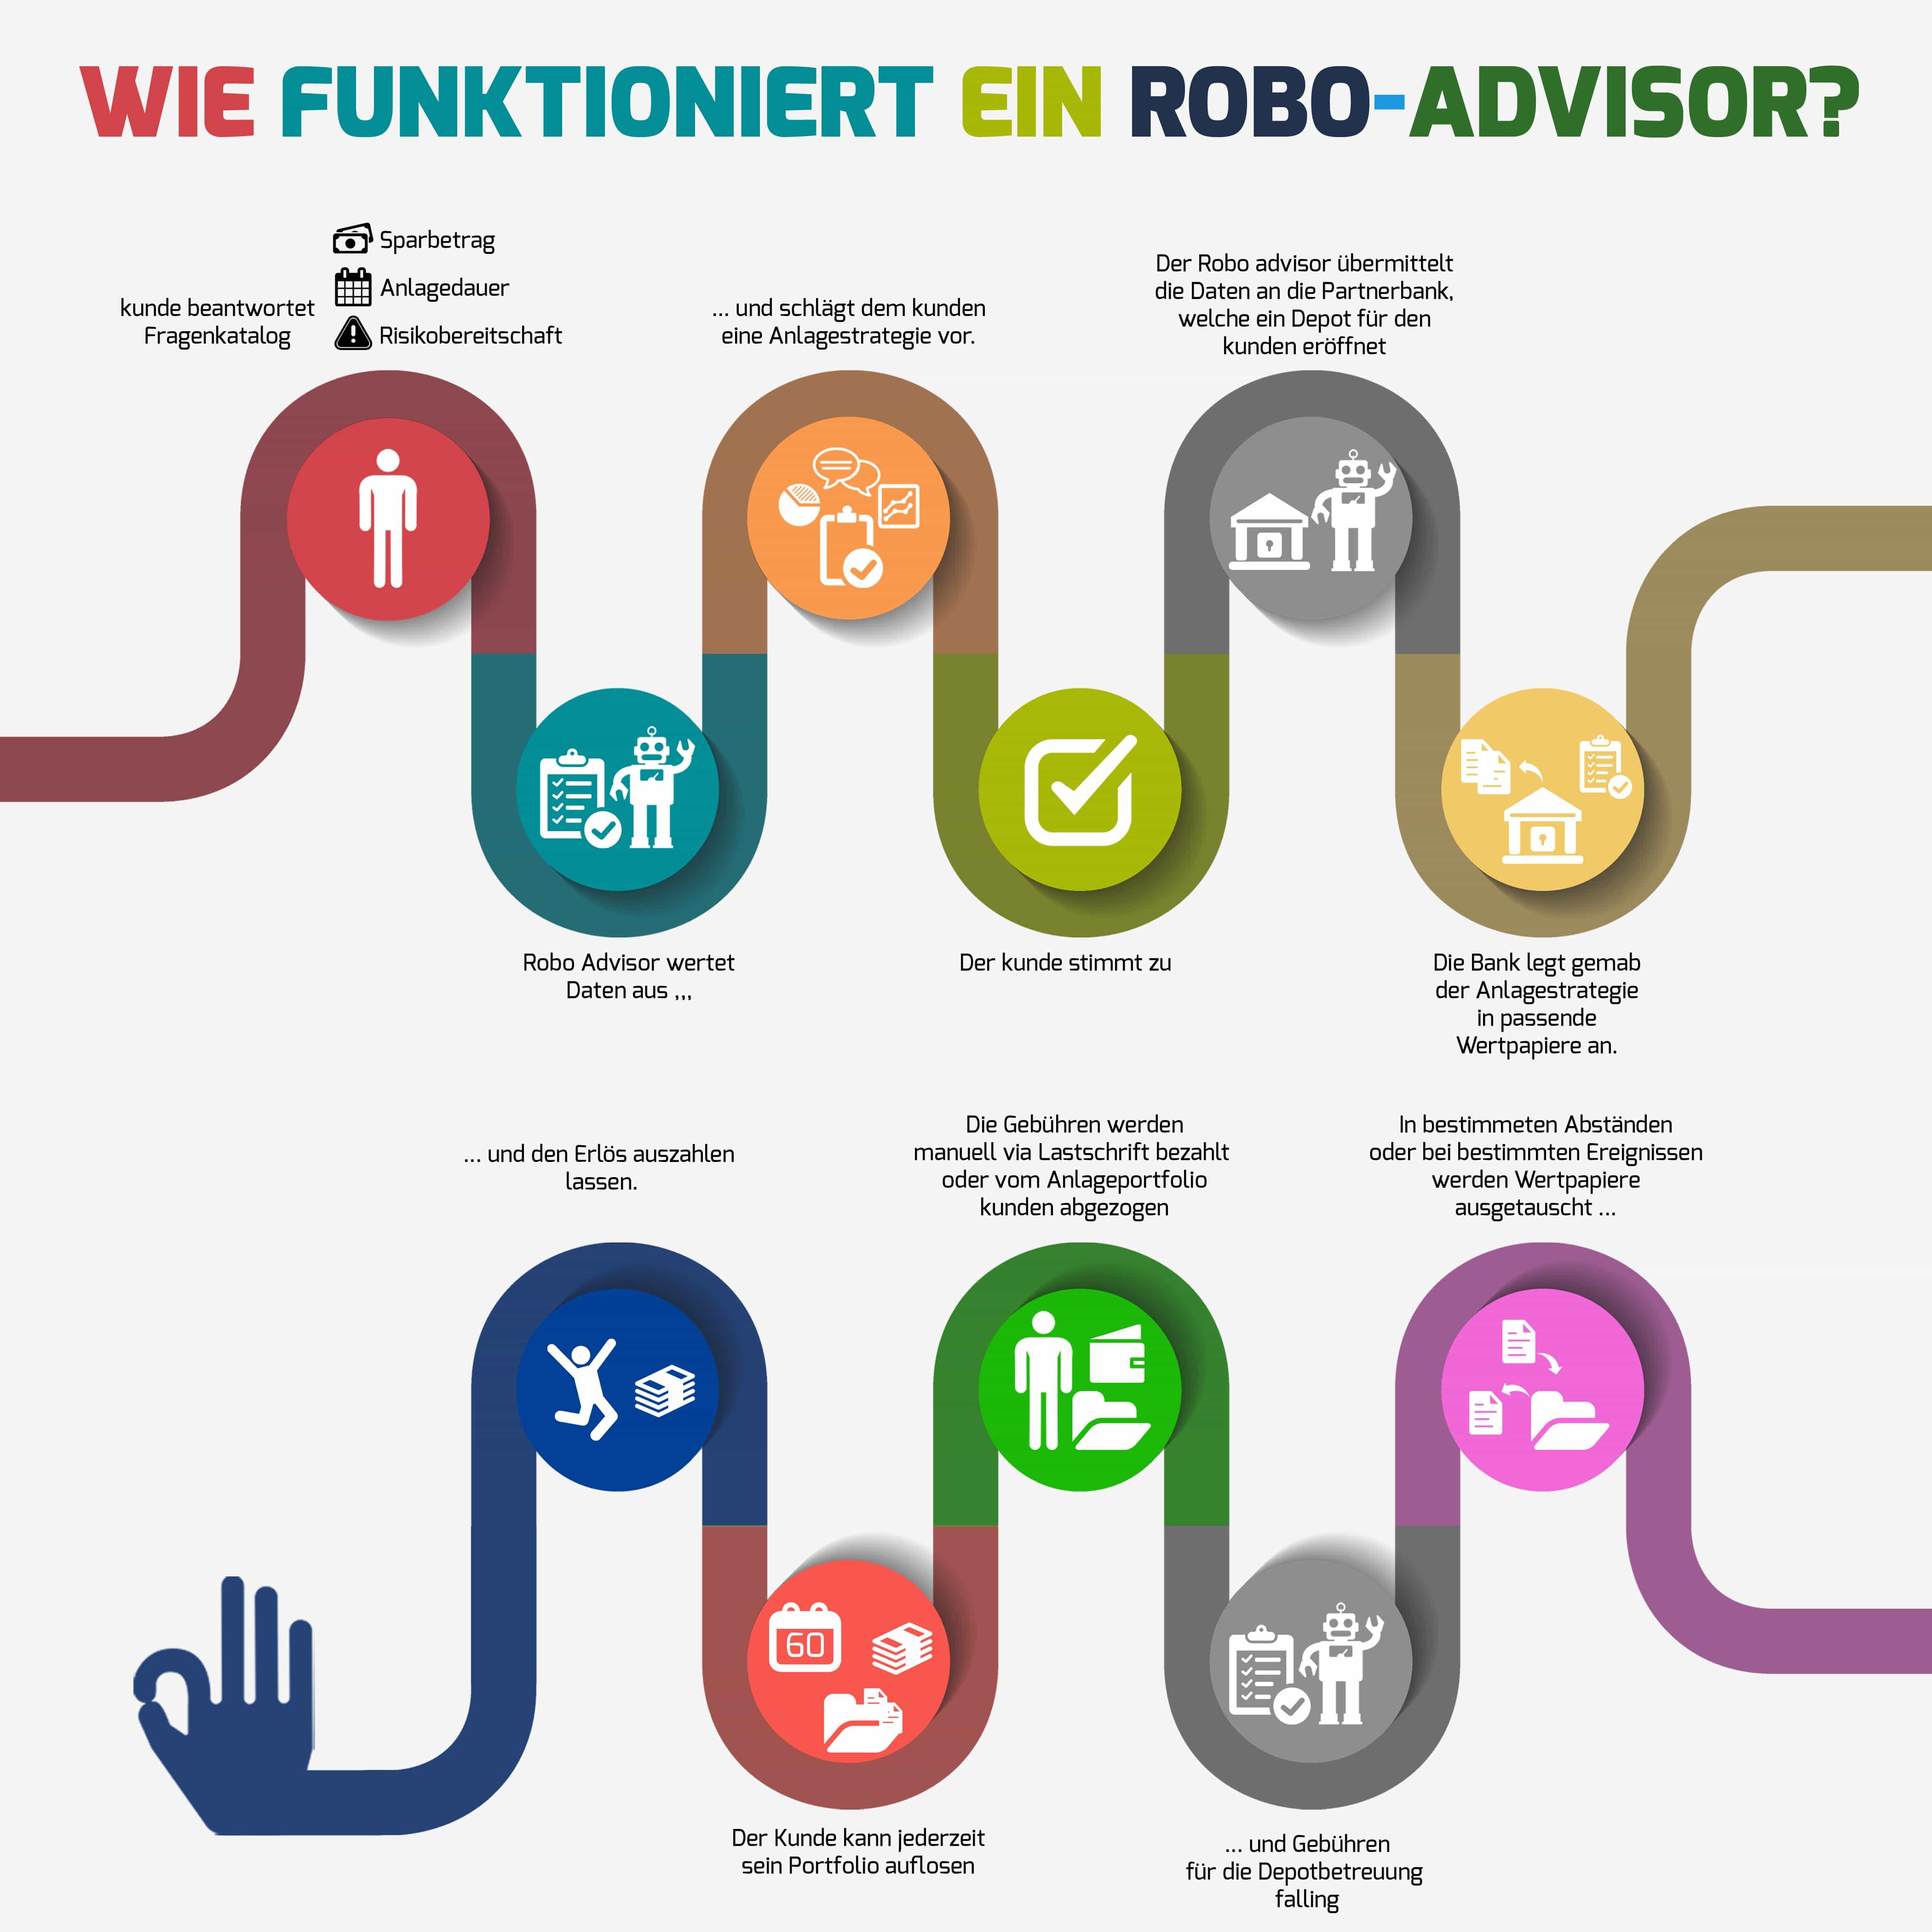 Funktionsweise eines Robo-Advisor